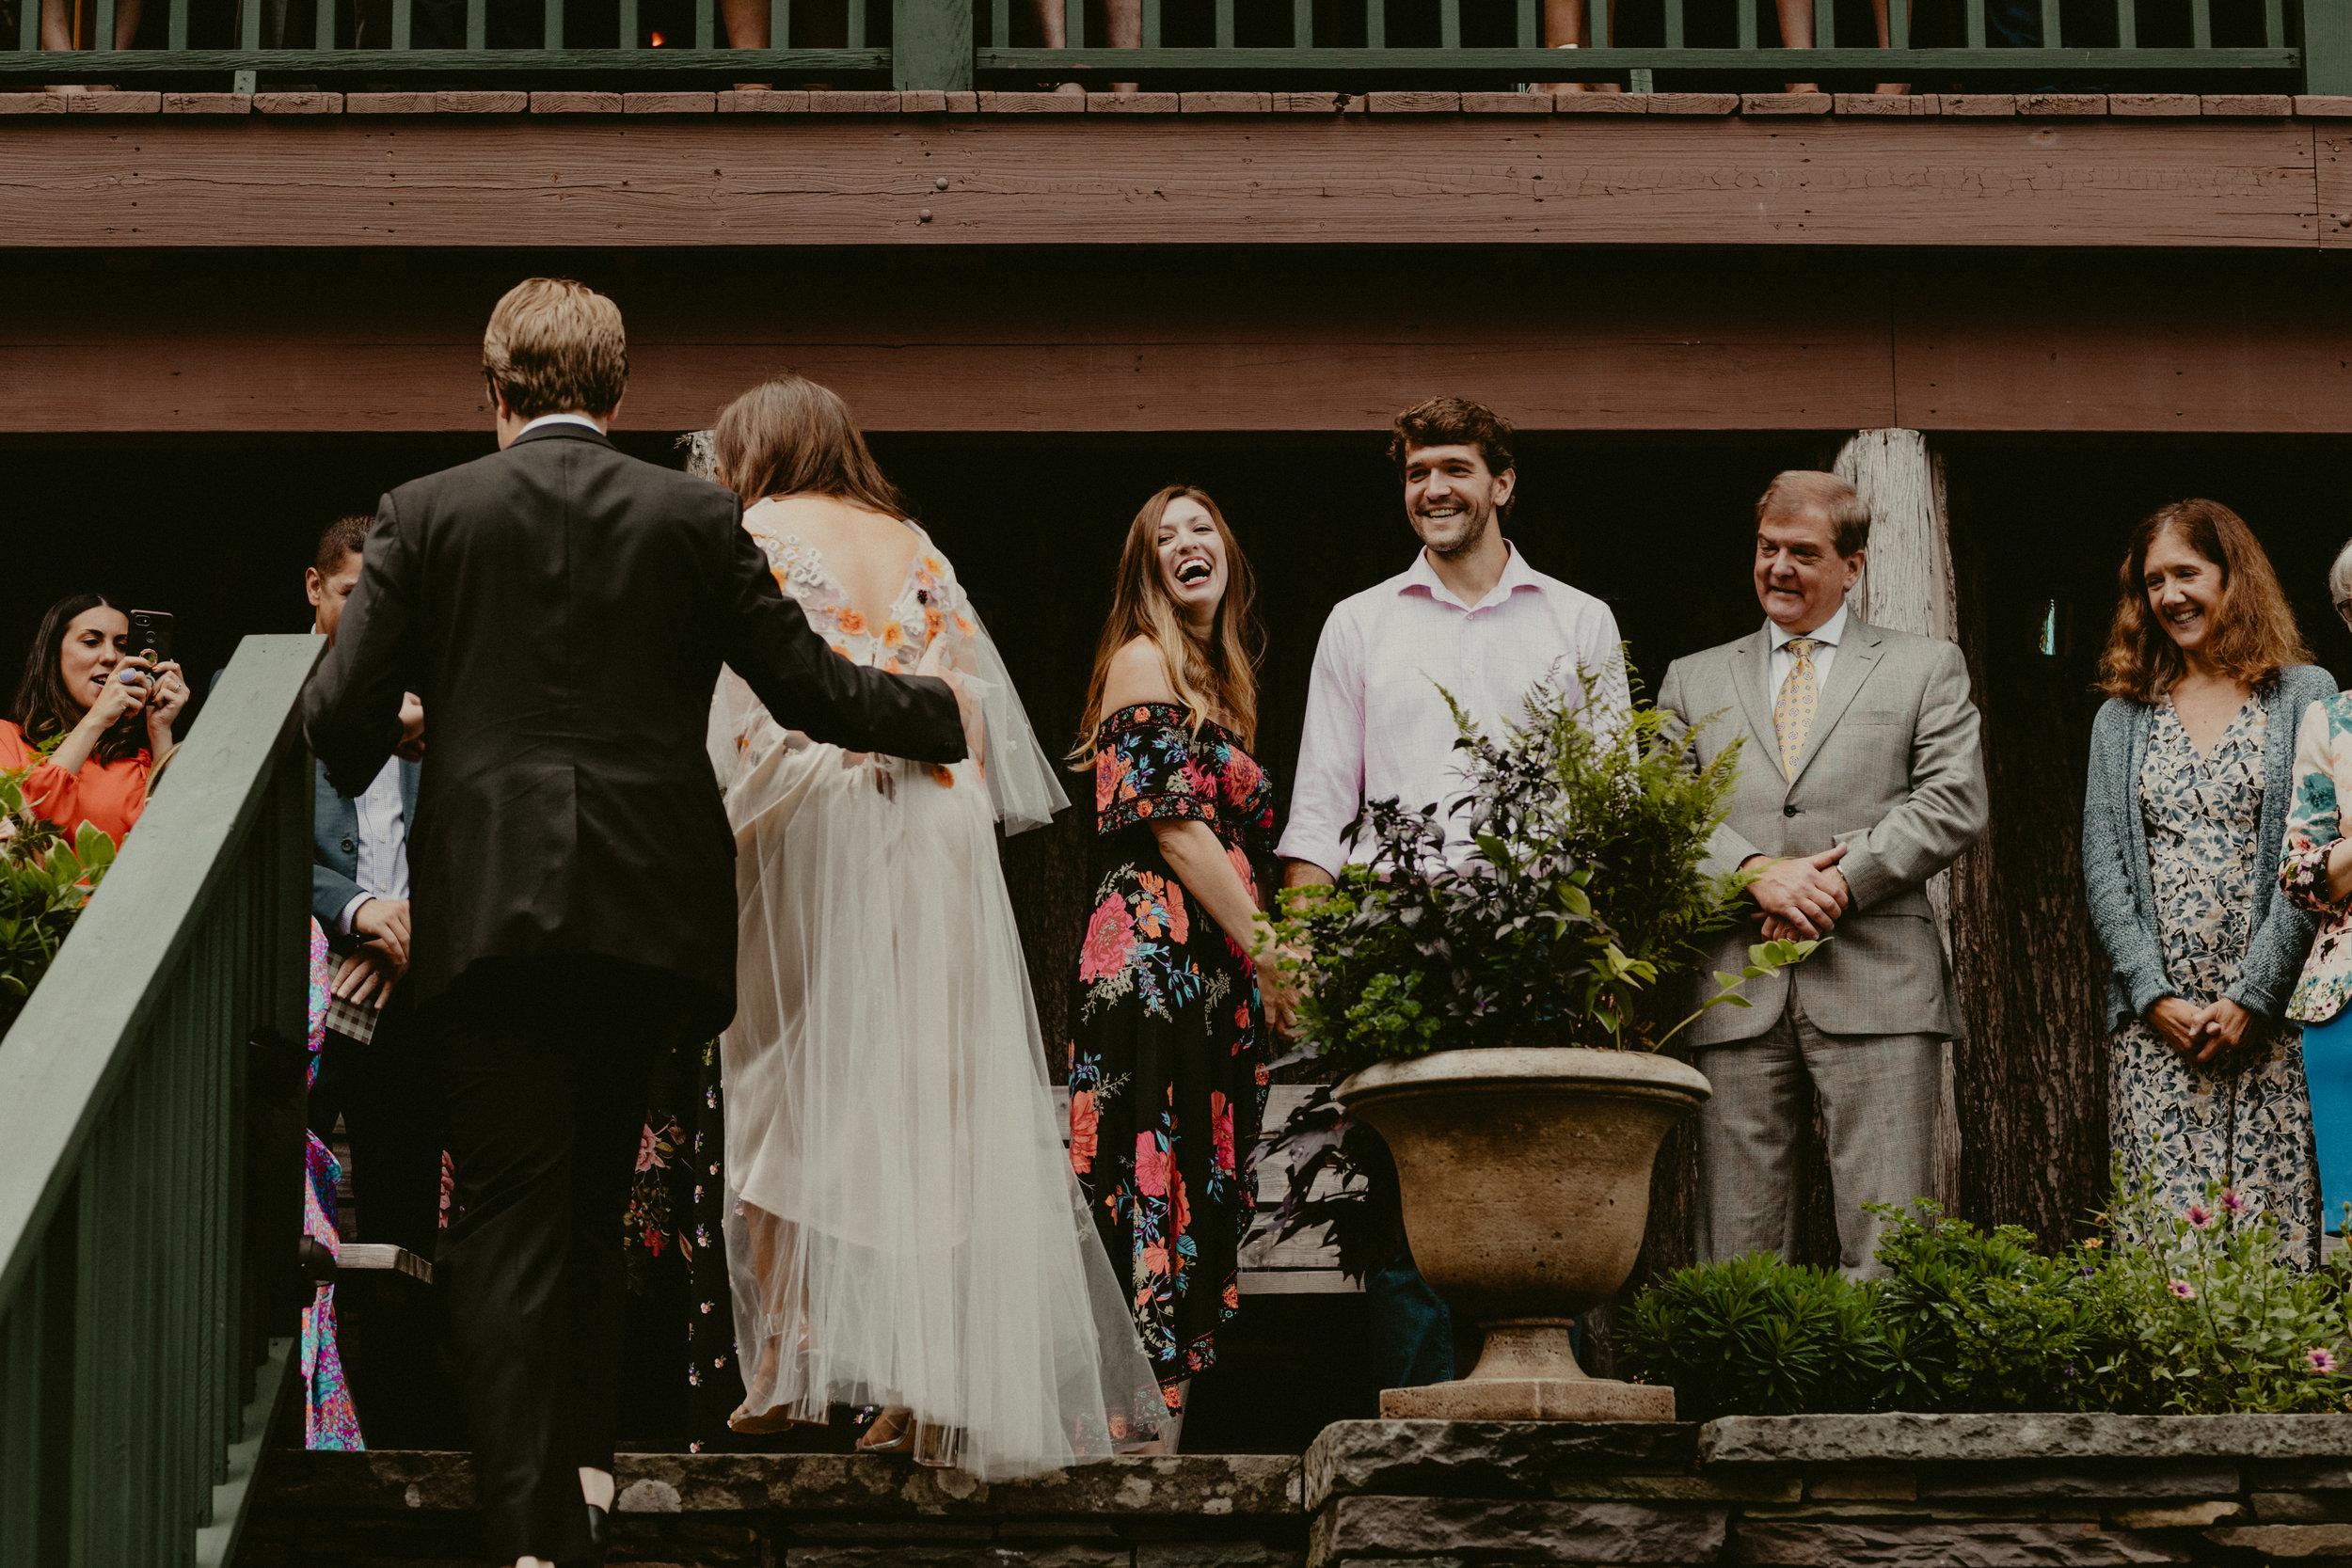 DEER_MOUNTAIN_INN_WEDDING_CHELLISE_MICHAEL_PHOTOGRAPHY-1416.jpg